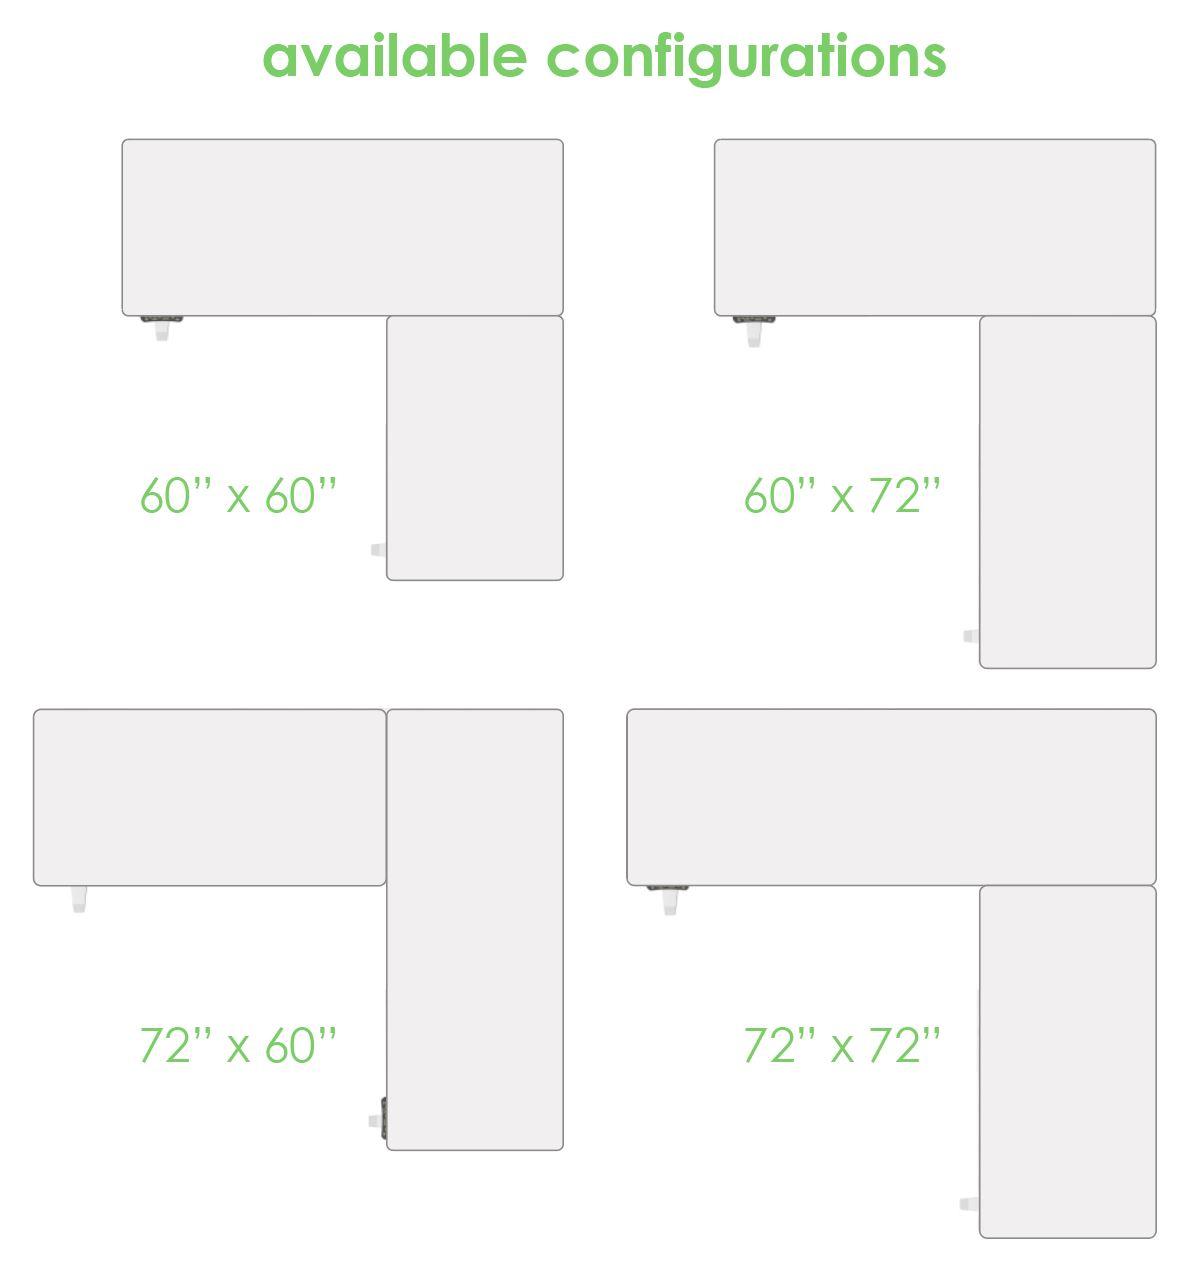 ldesk-configurations.jpg